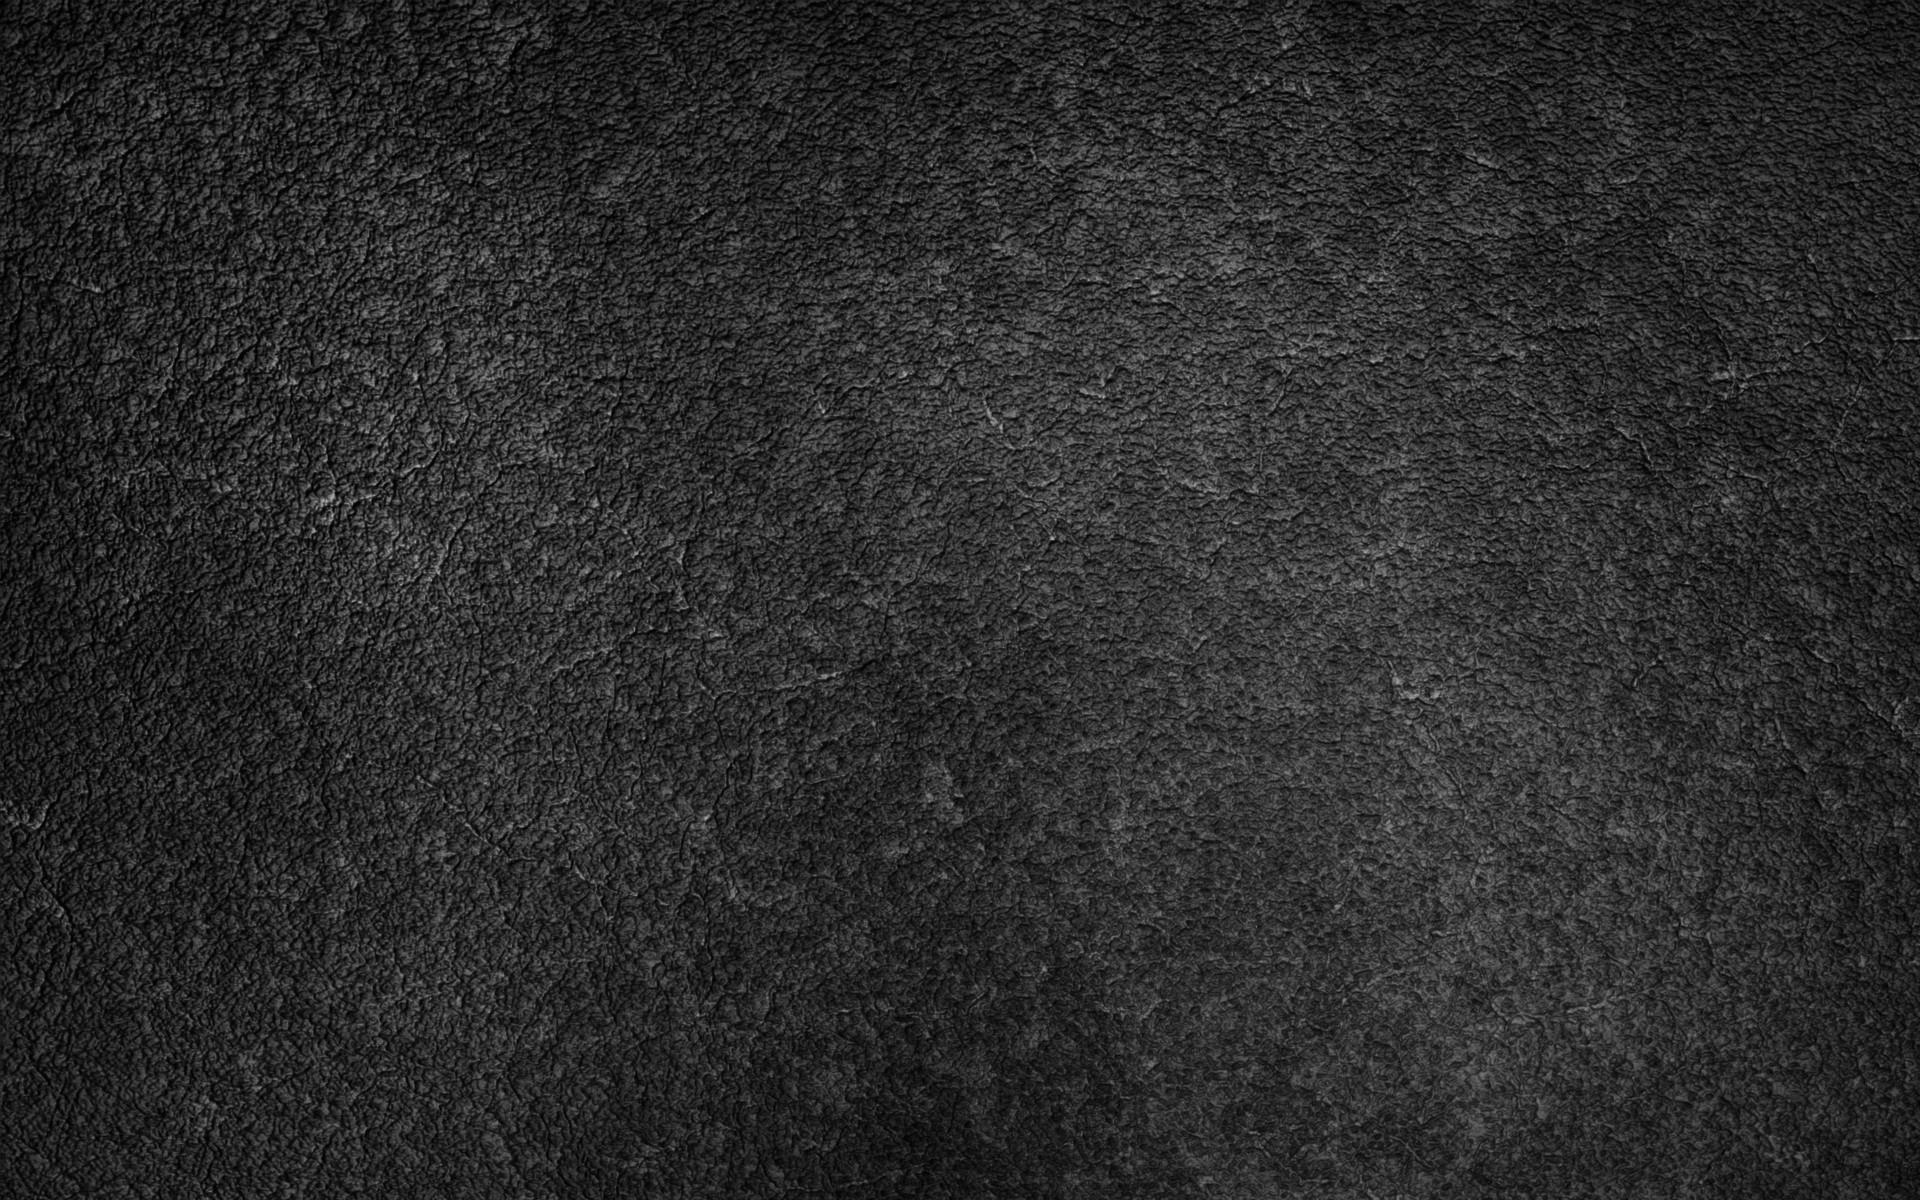 Black Asphalt Wall with Cracks   Photo Texture Background   Adorable ...